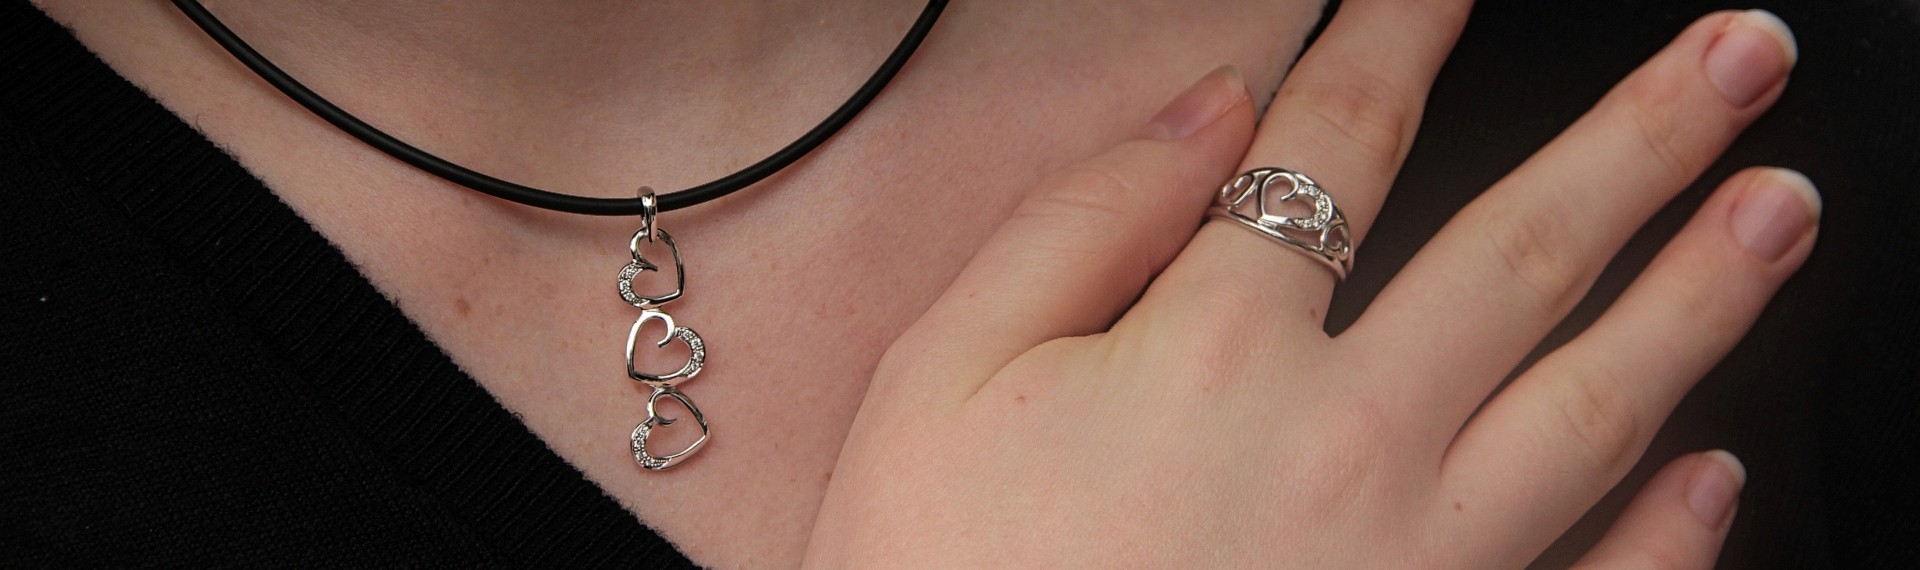 Duo Pendant and ring ORILOVE Brilliant